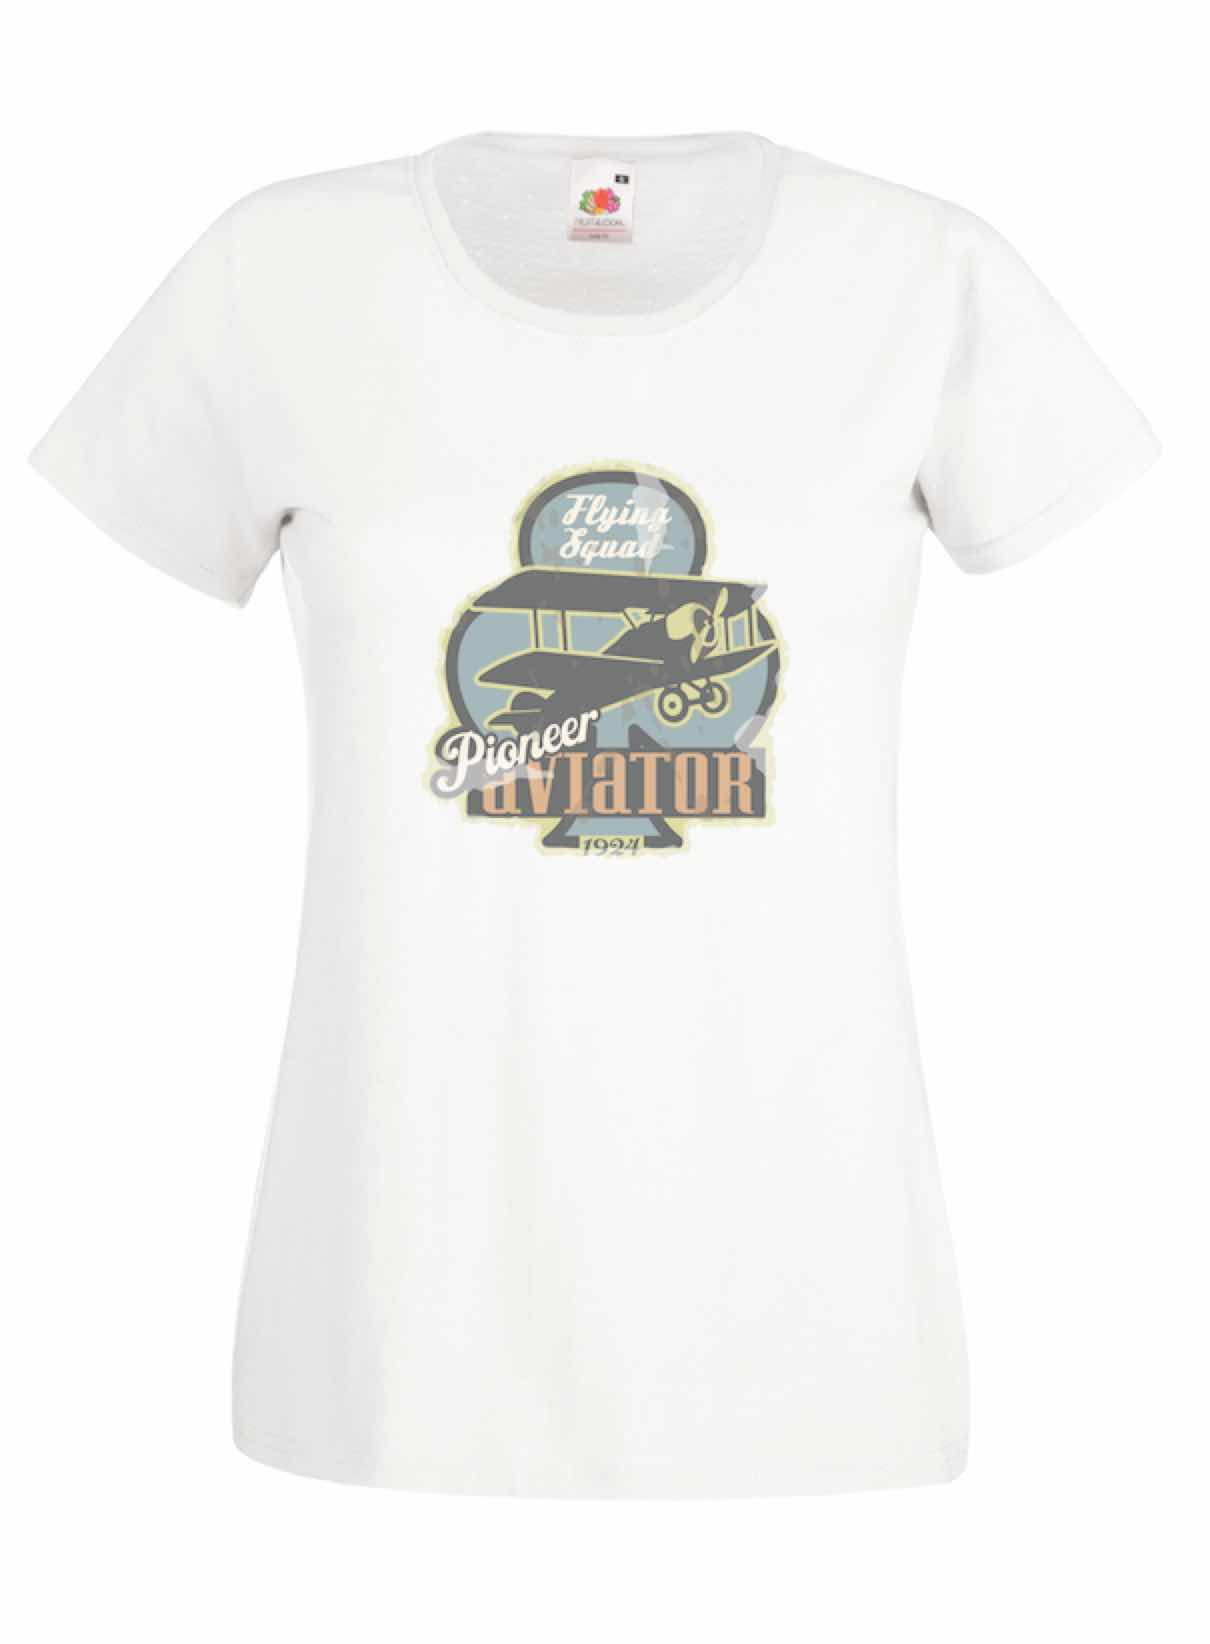 Pioneer Aviator design for t-shirt, hoodie & sweatshirt